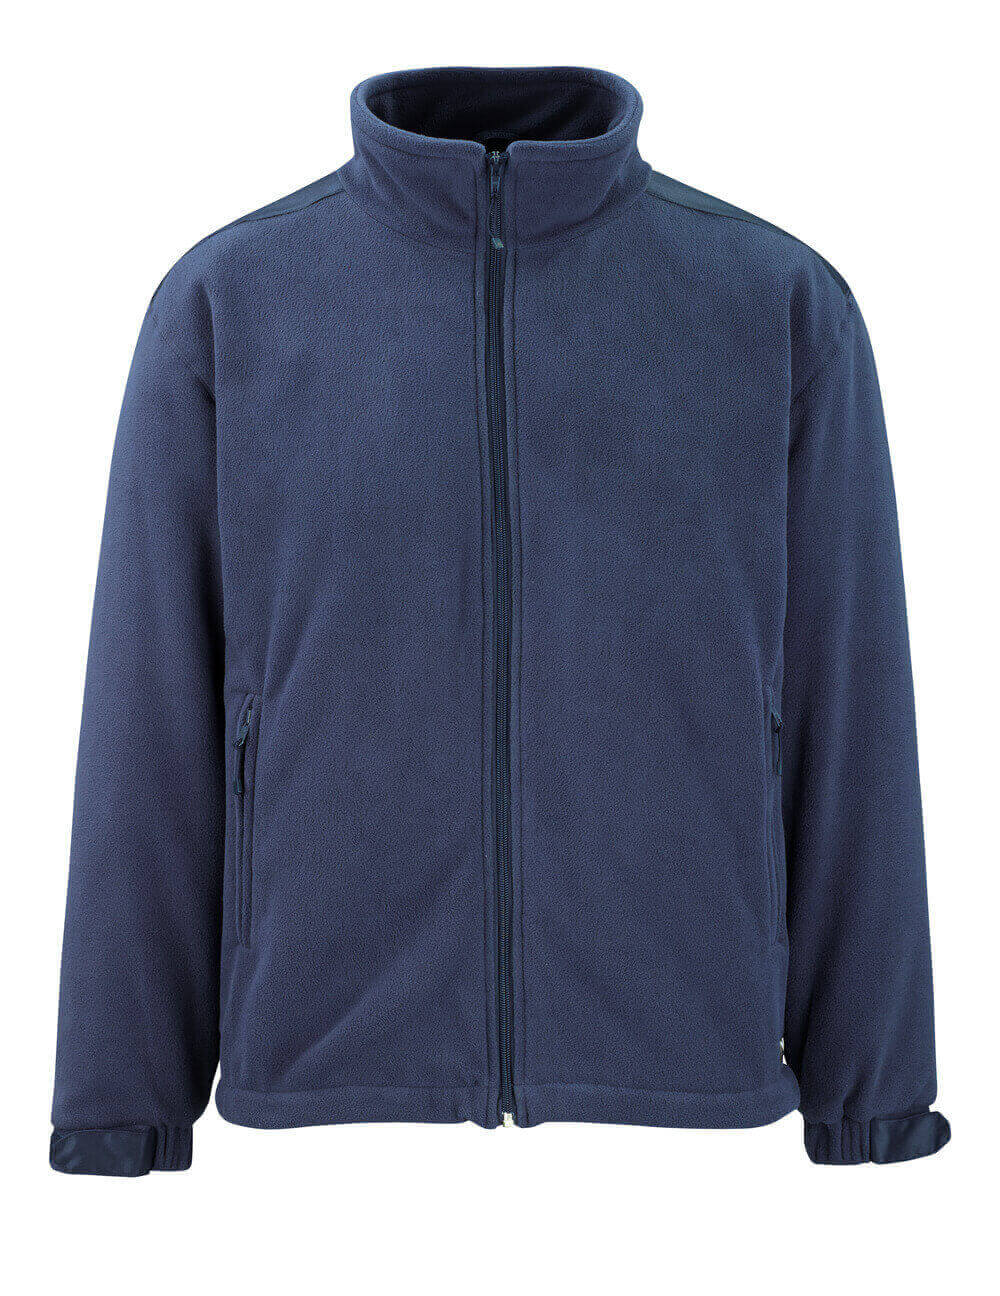 06542-151-01 Fleece Jacket - navy